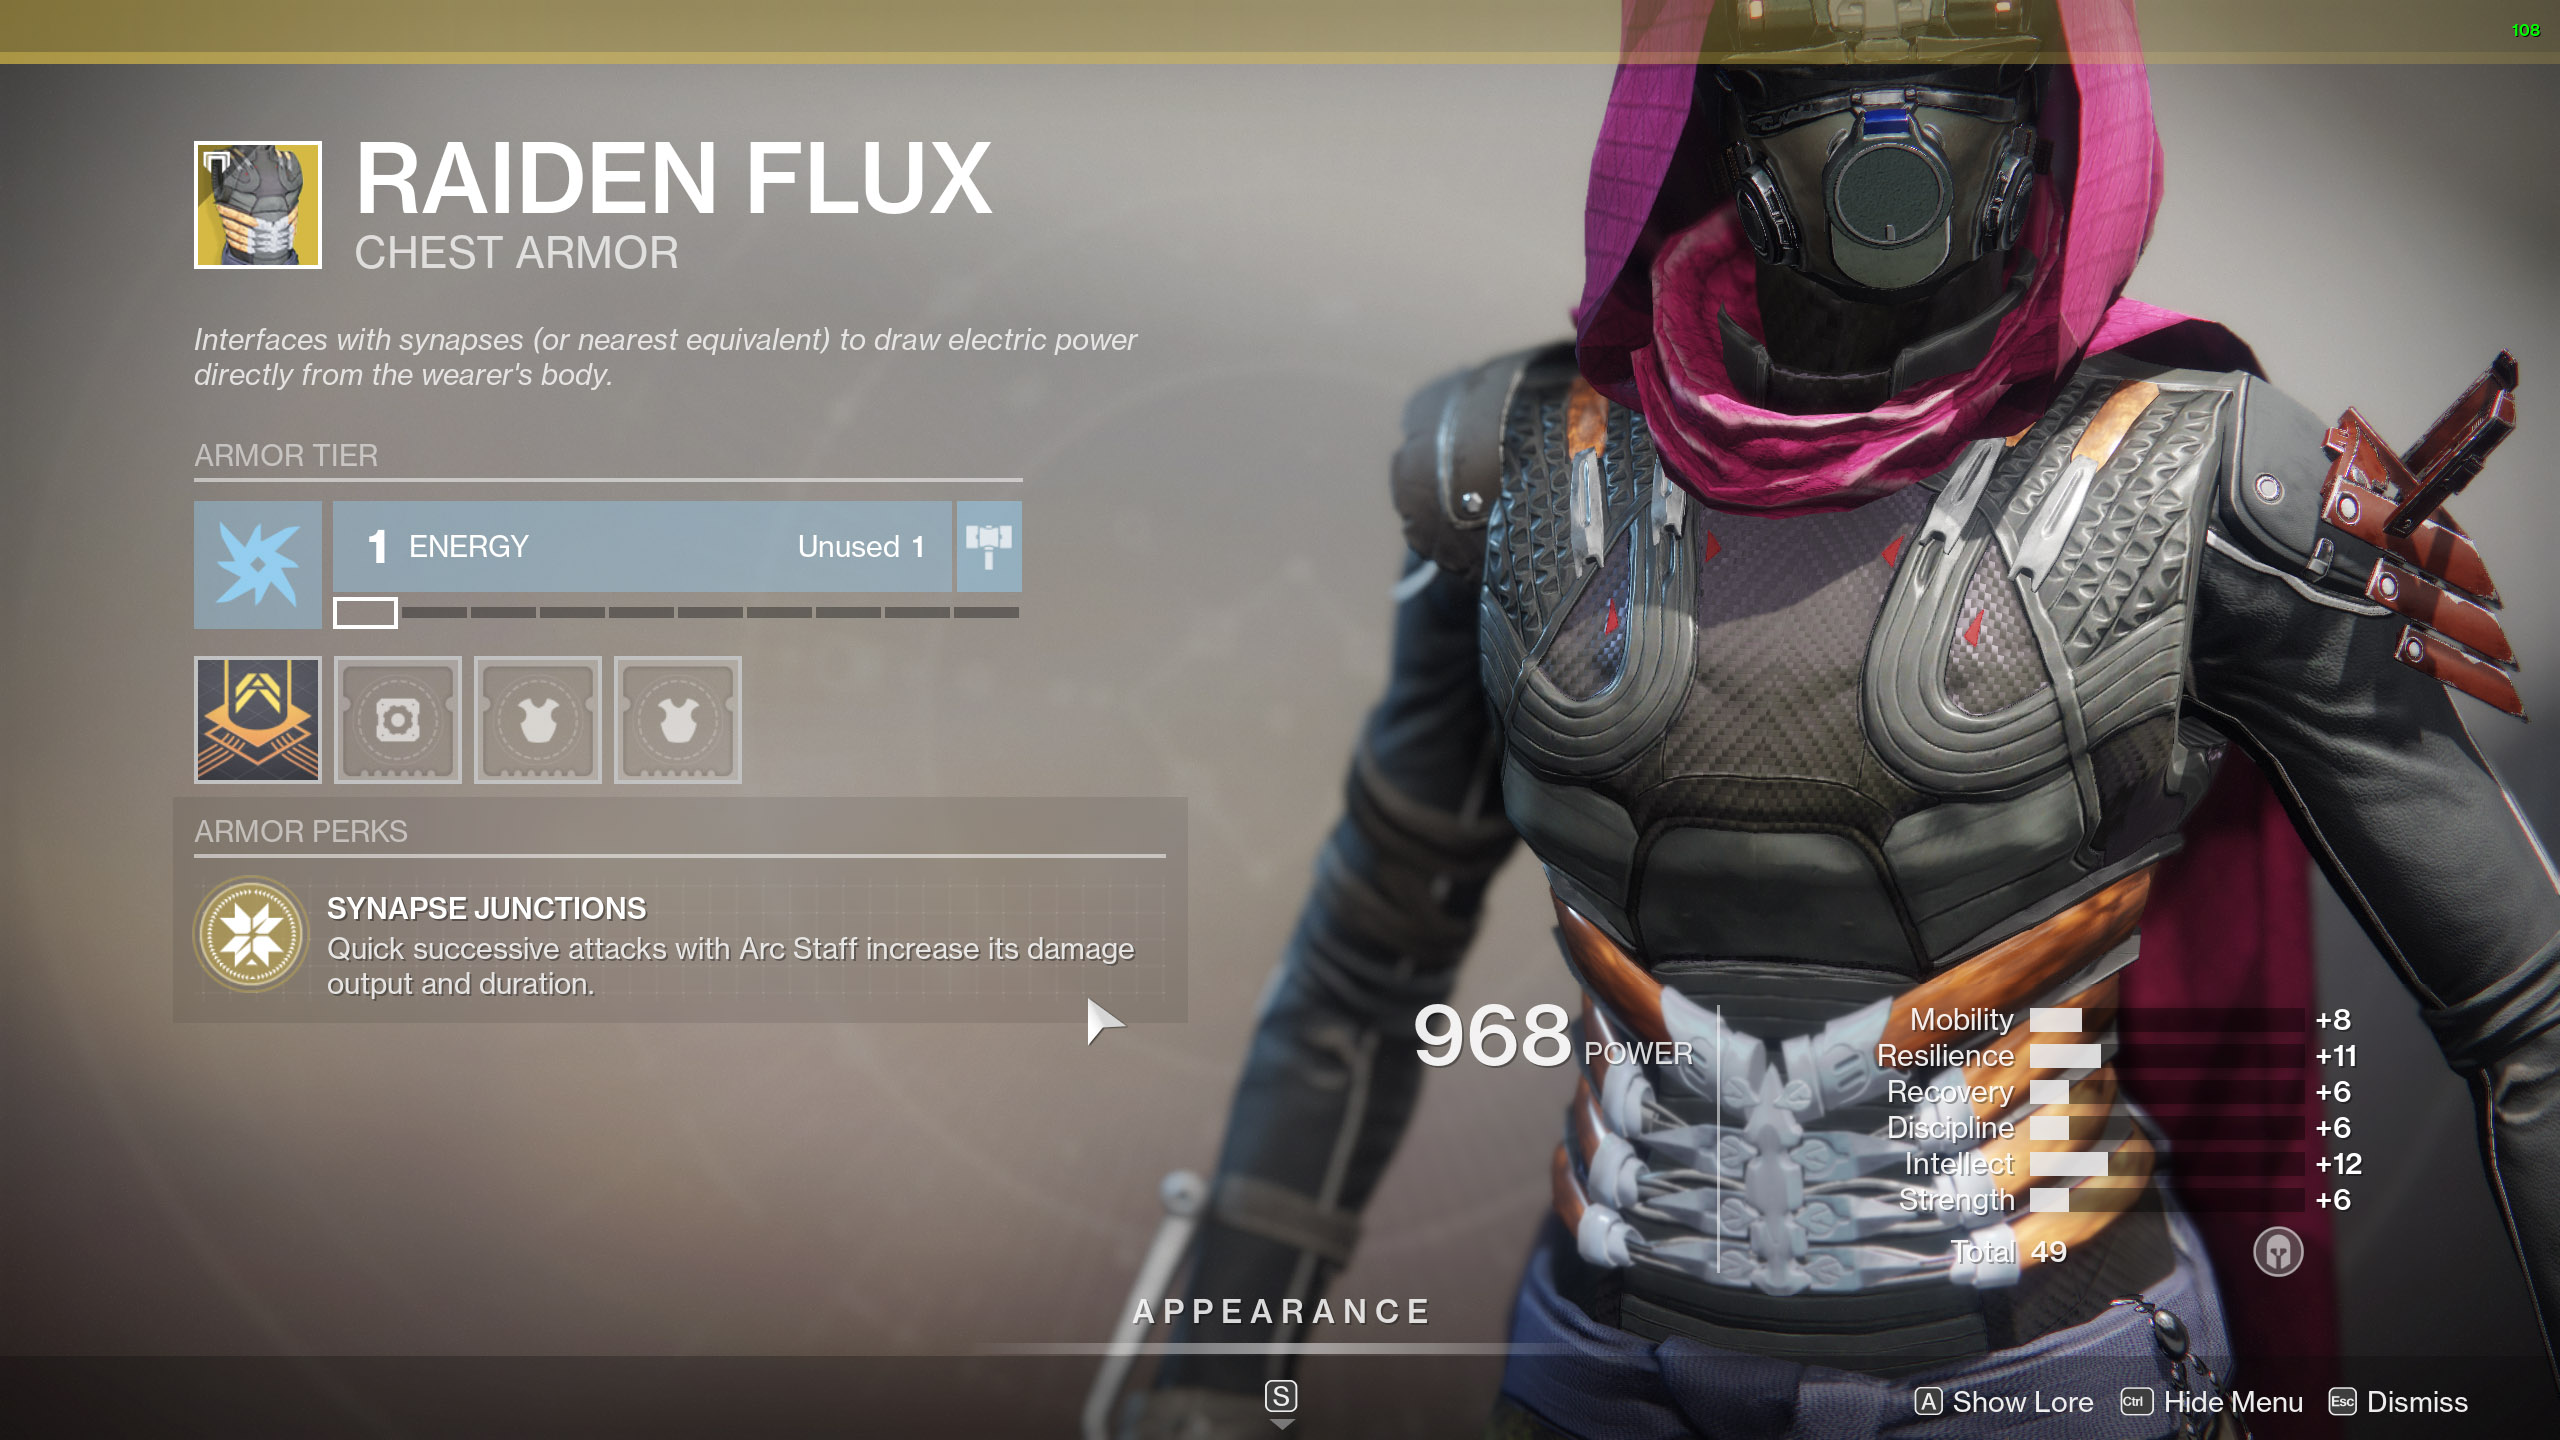 Destiny 2 Exotic Hunter armor Raiden Flux